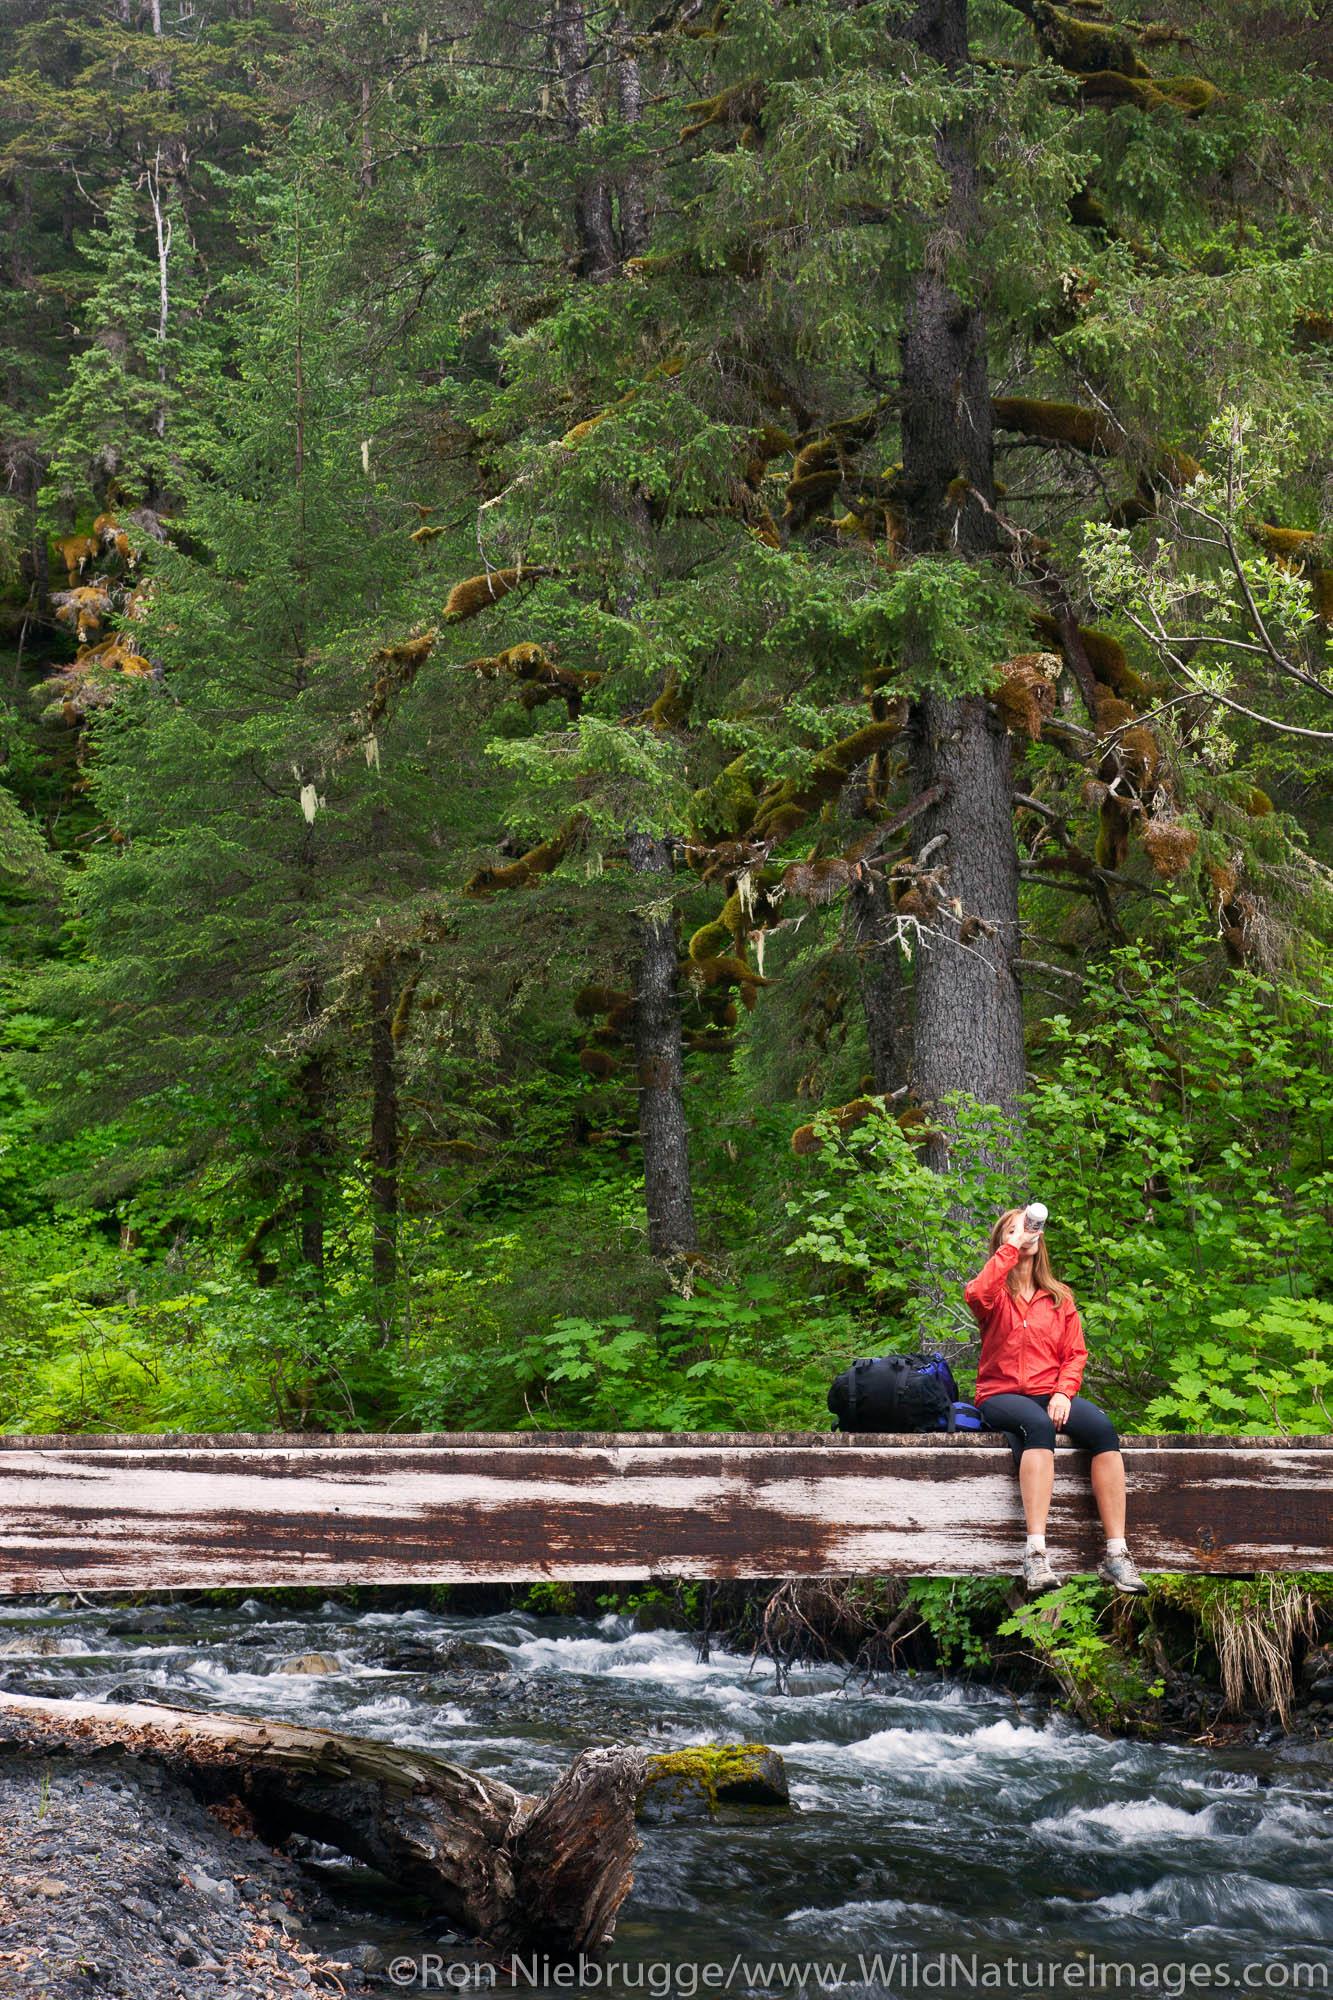 Hiking on the Resurrection River Trail, Chugach National Forest, Alaska.